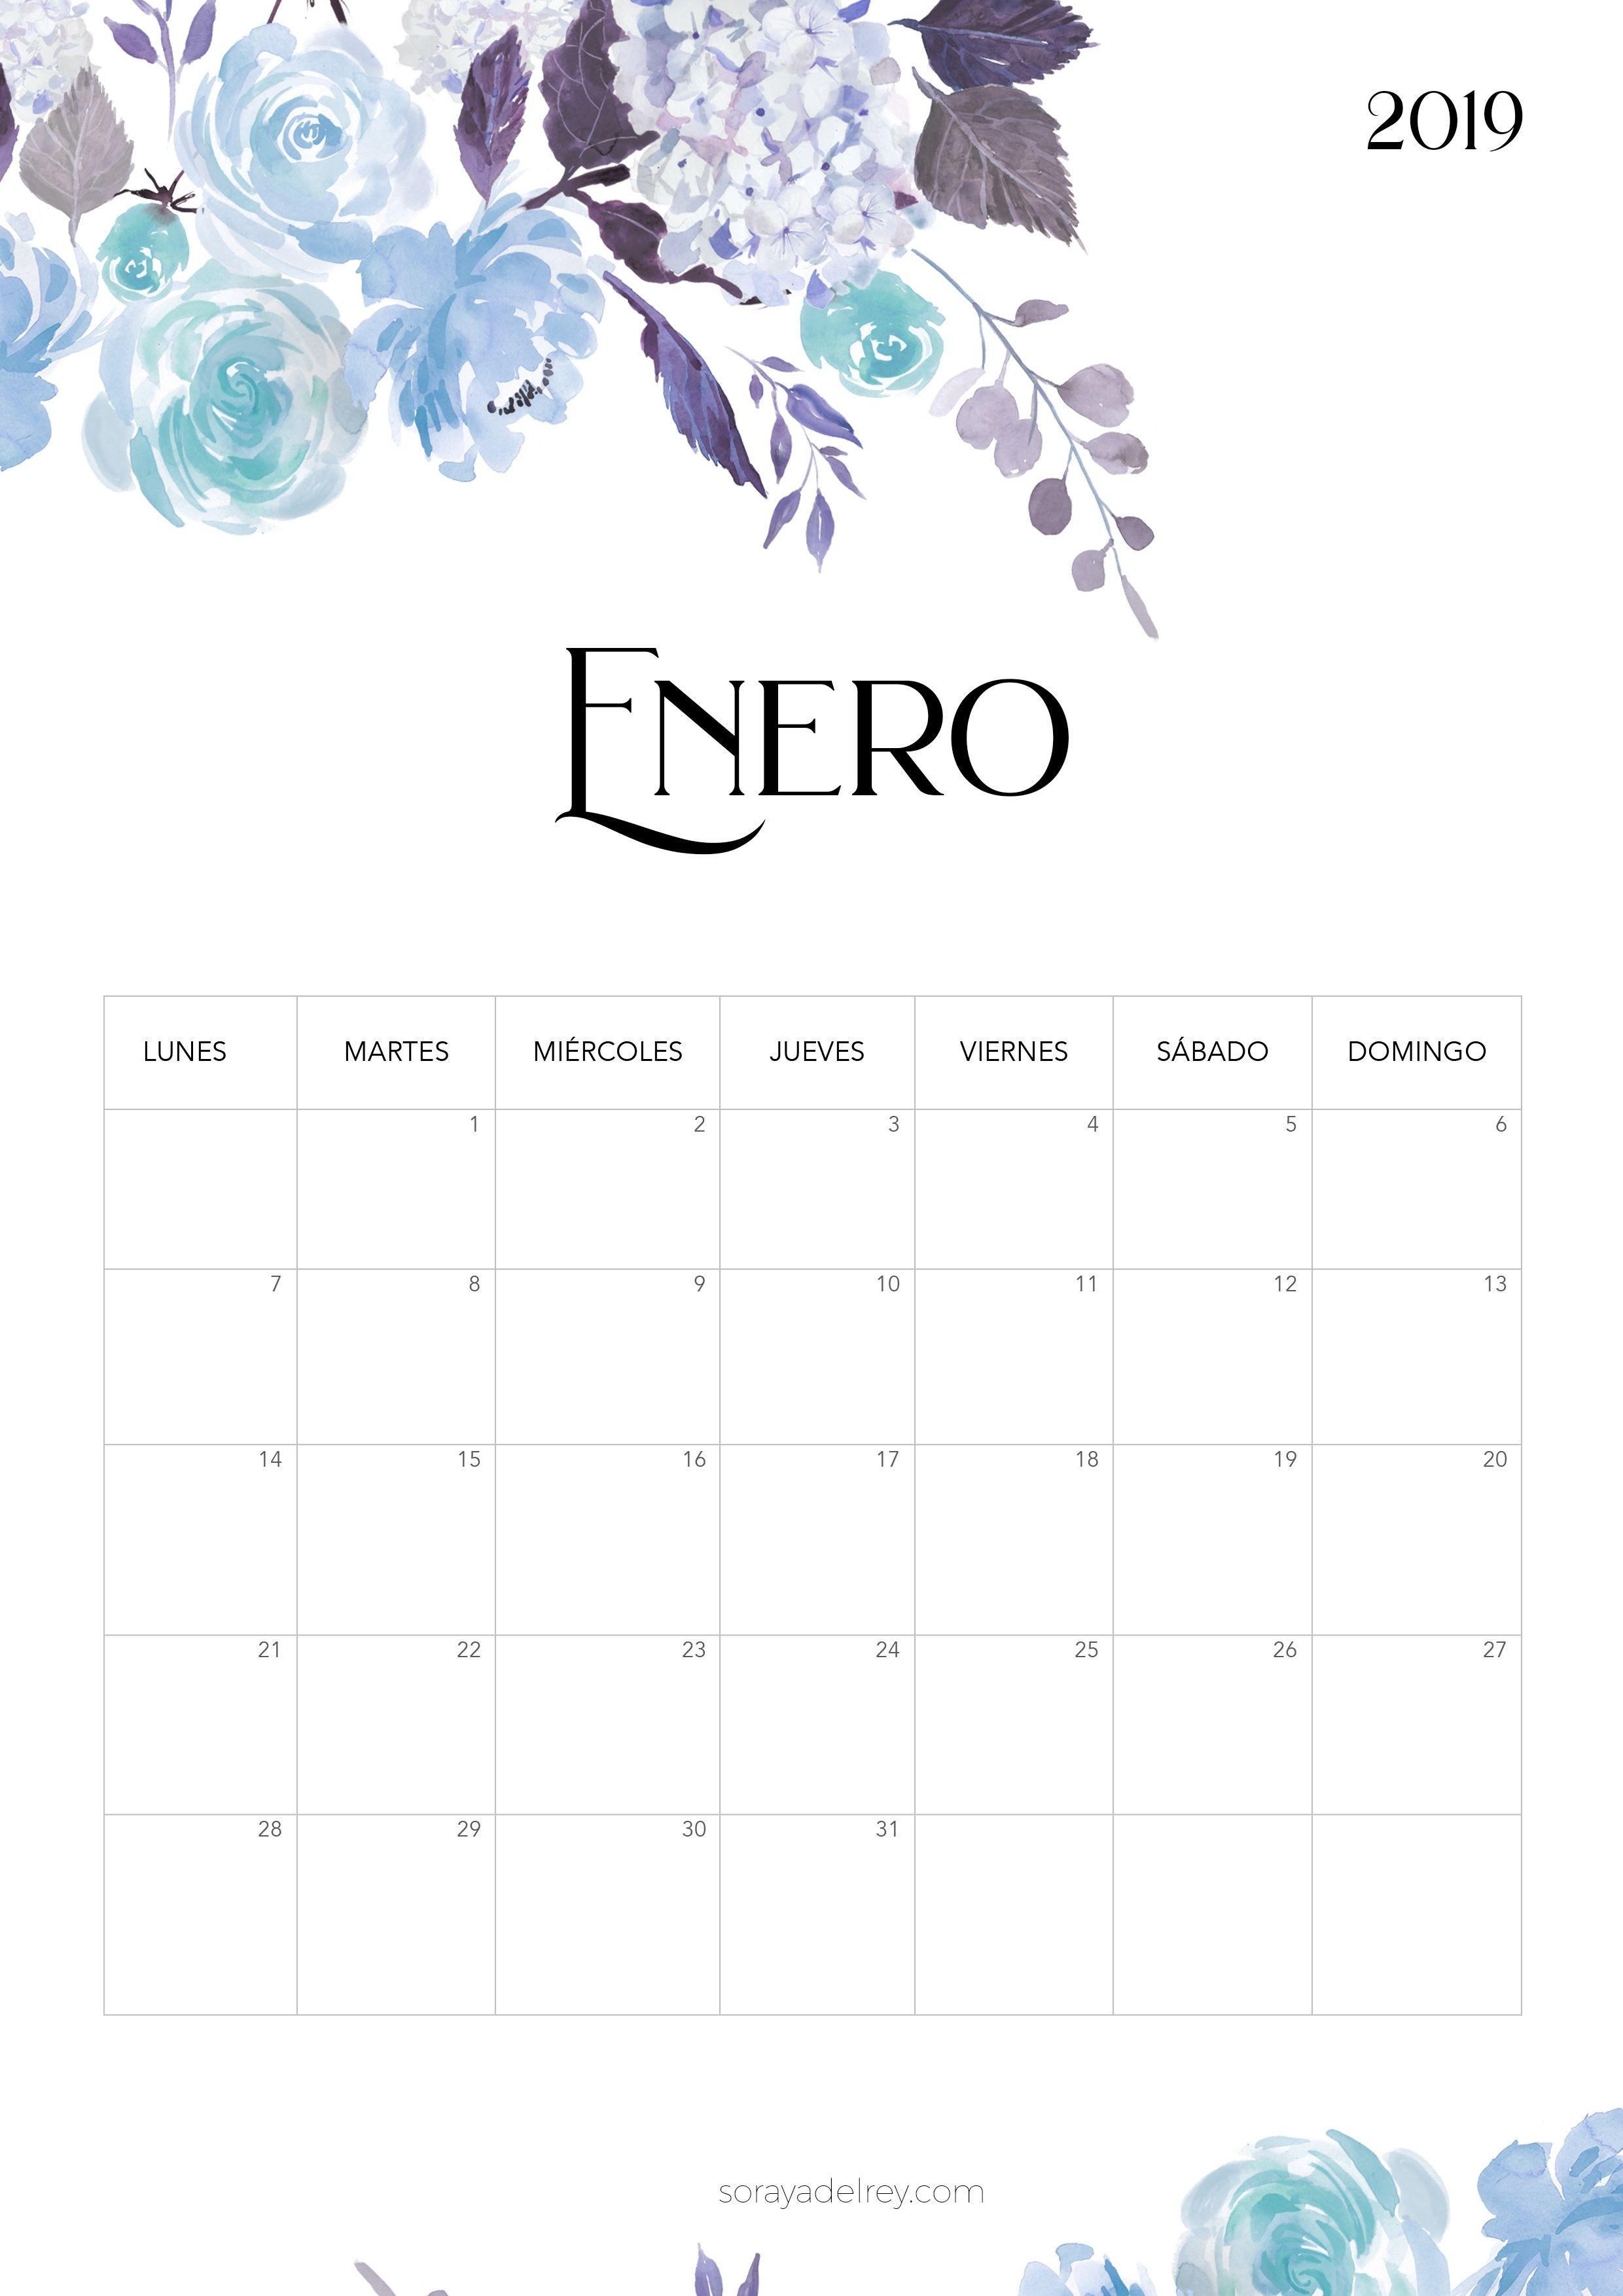 Calendario para imprimir Enero 2019 calendario calendar enero january printable freebie imprimir papeleria flores azul blue